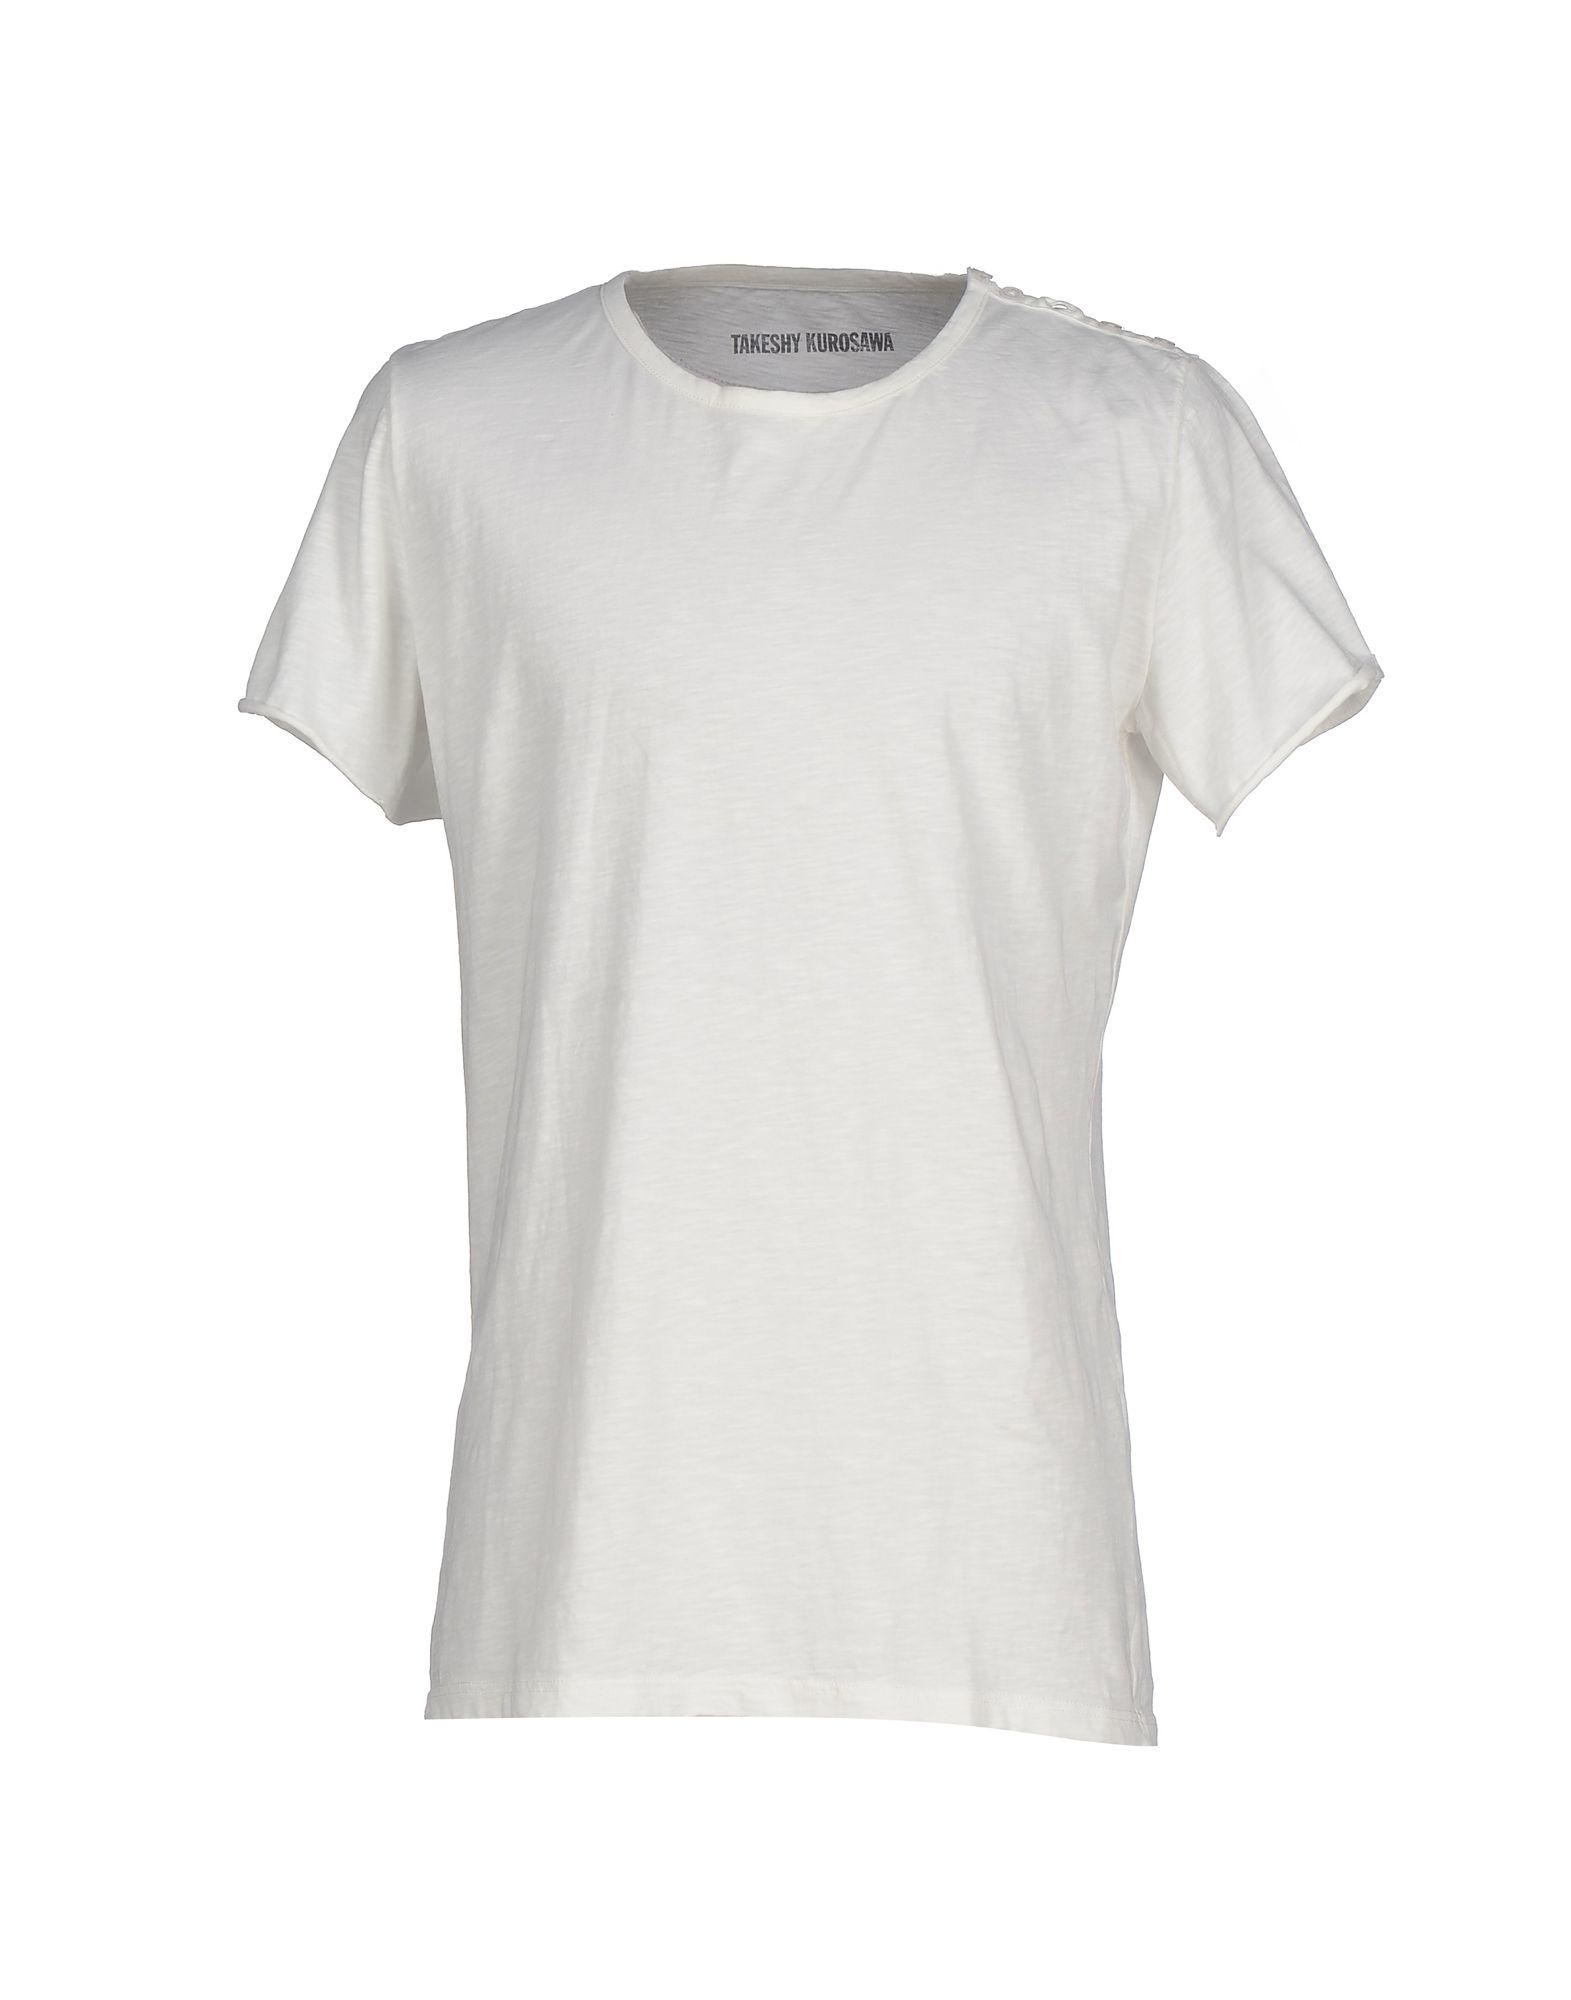 Lyst - Takeshy Kurosawa T-shirt in White for Men